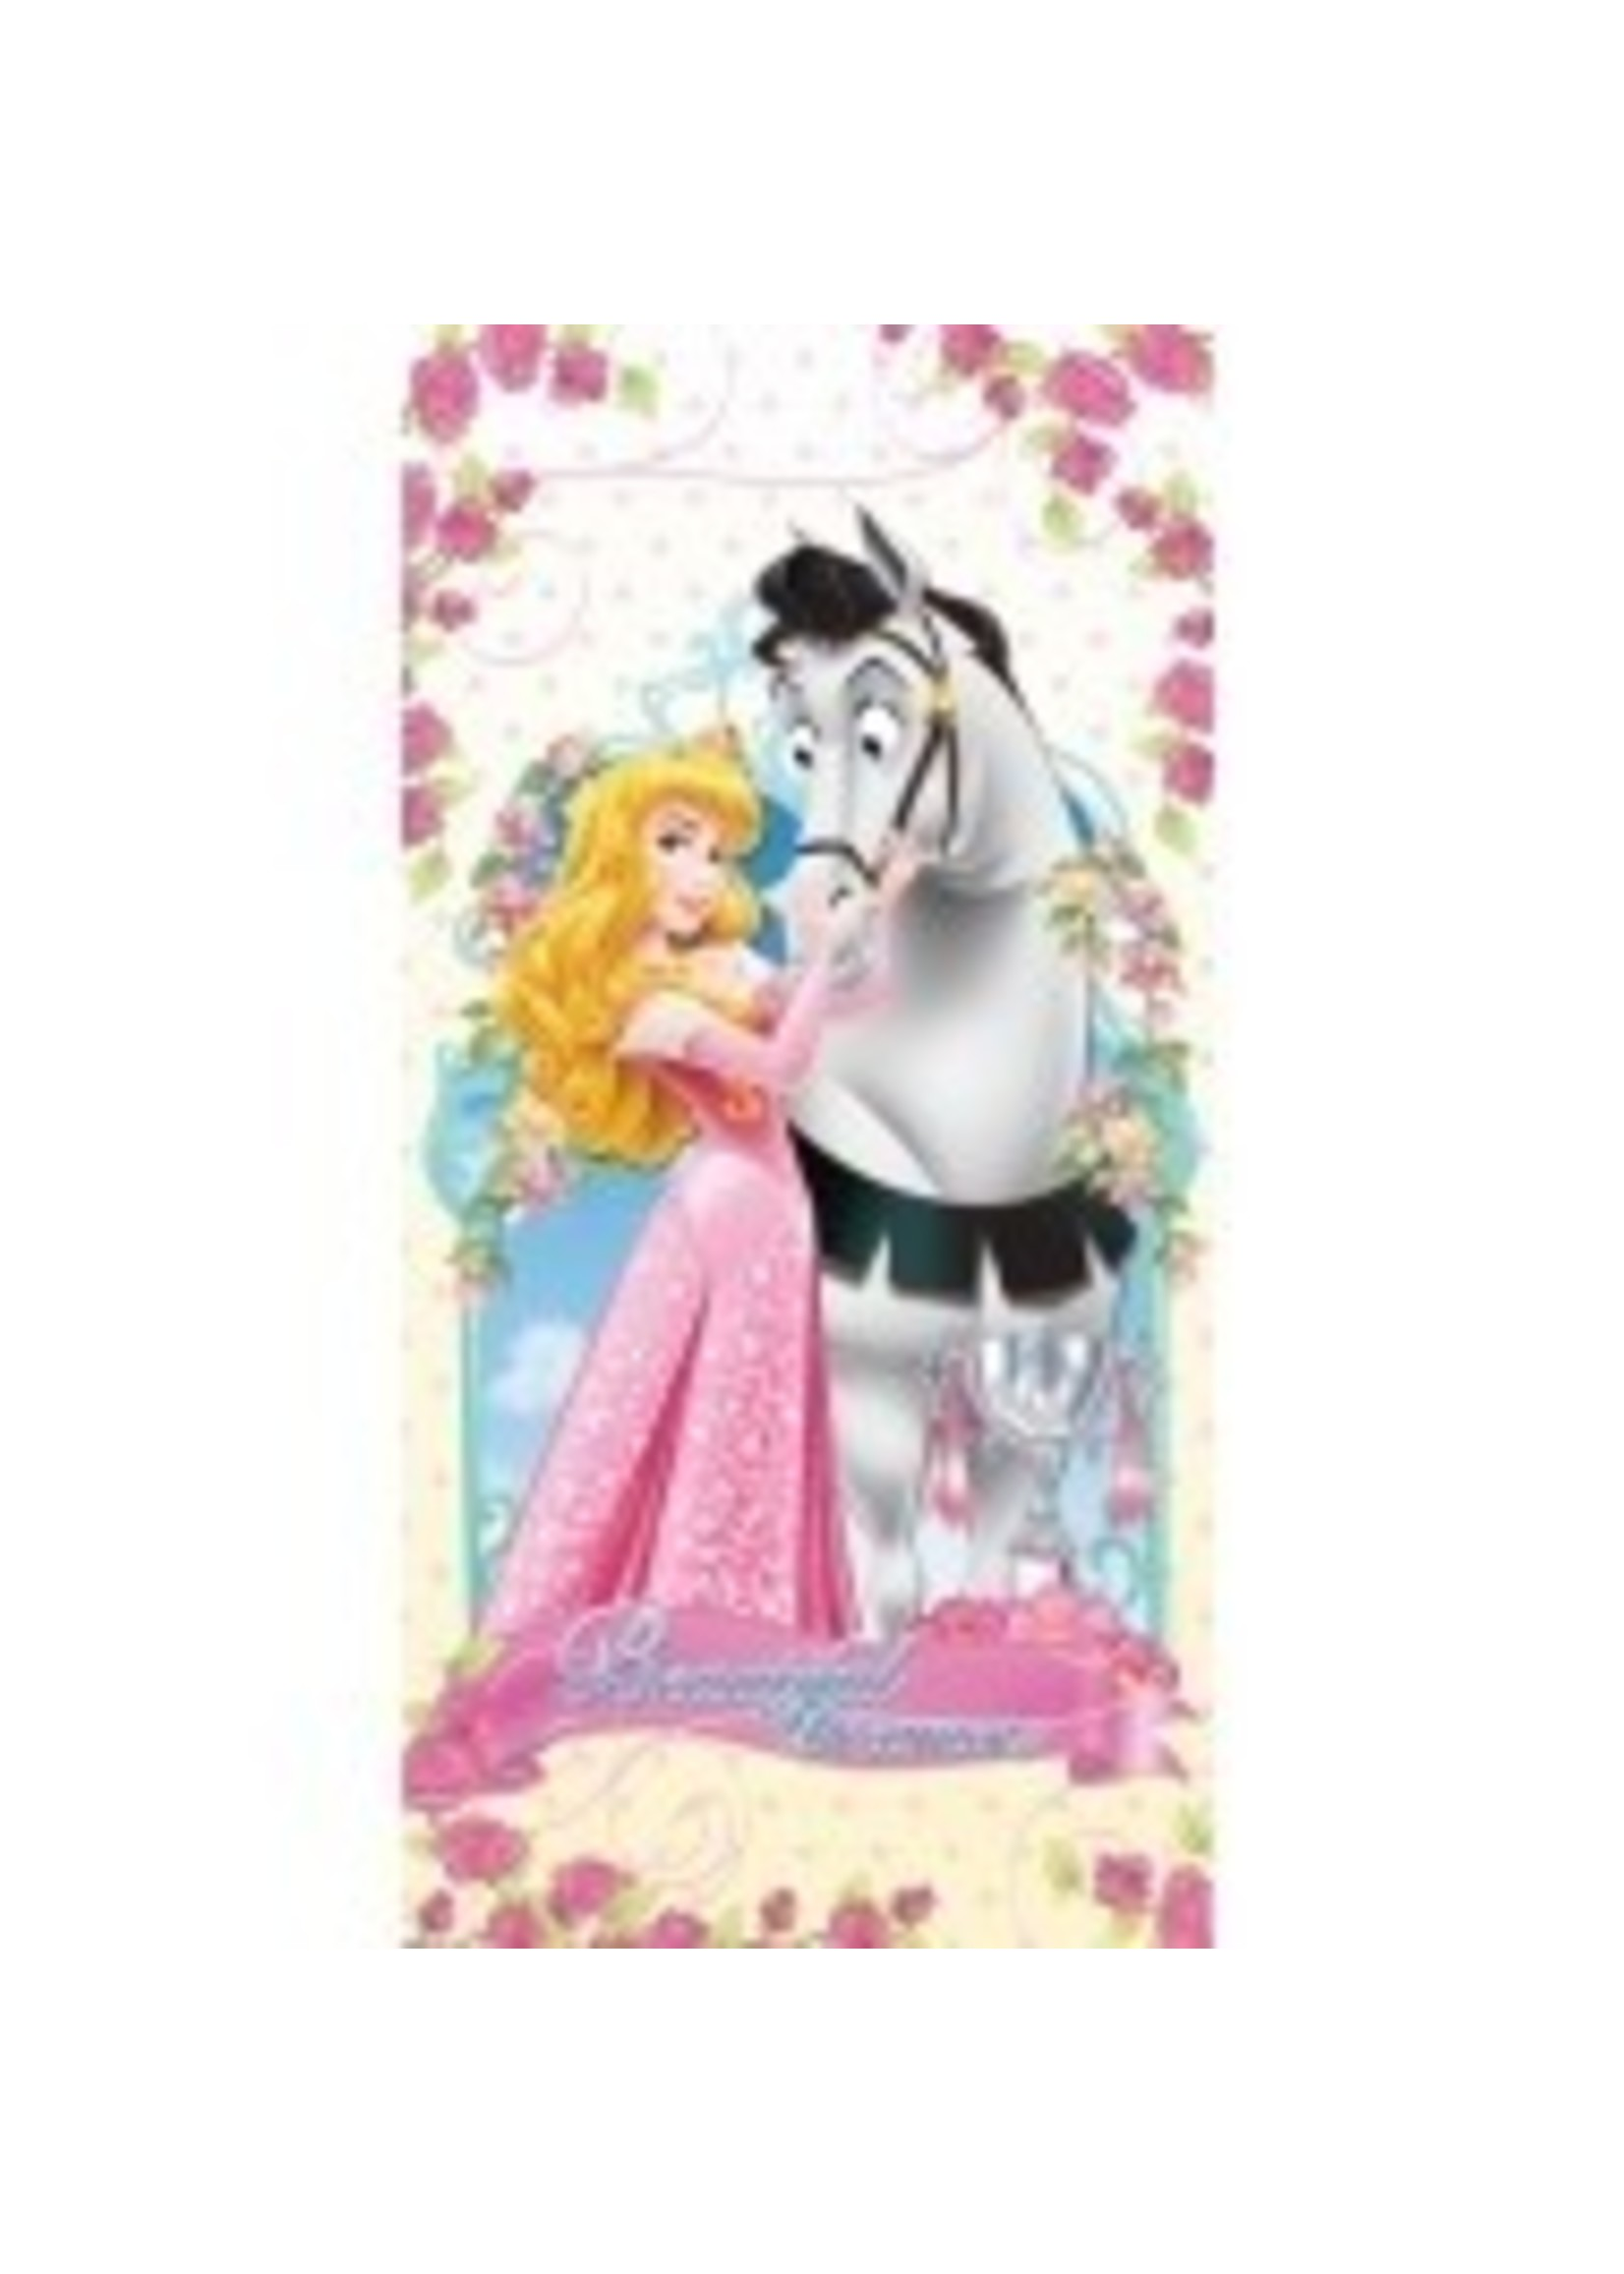 Disney Princess Princess Handdoek Paard